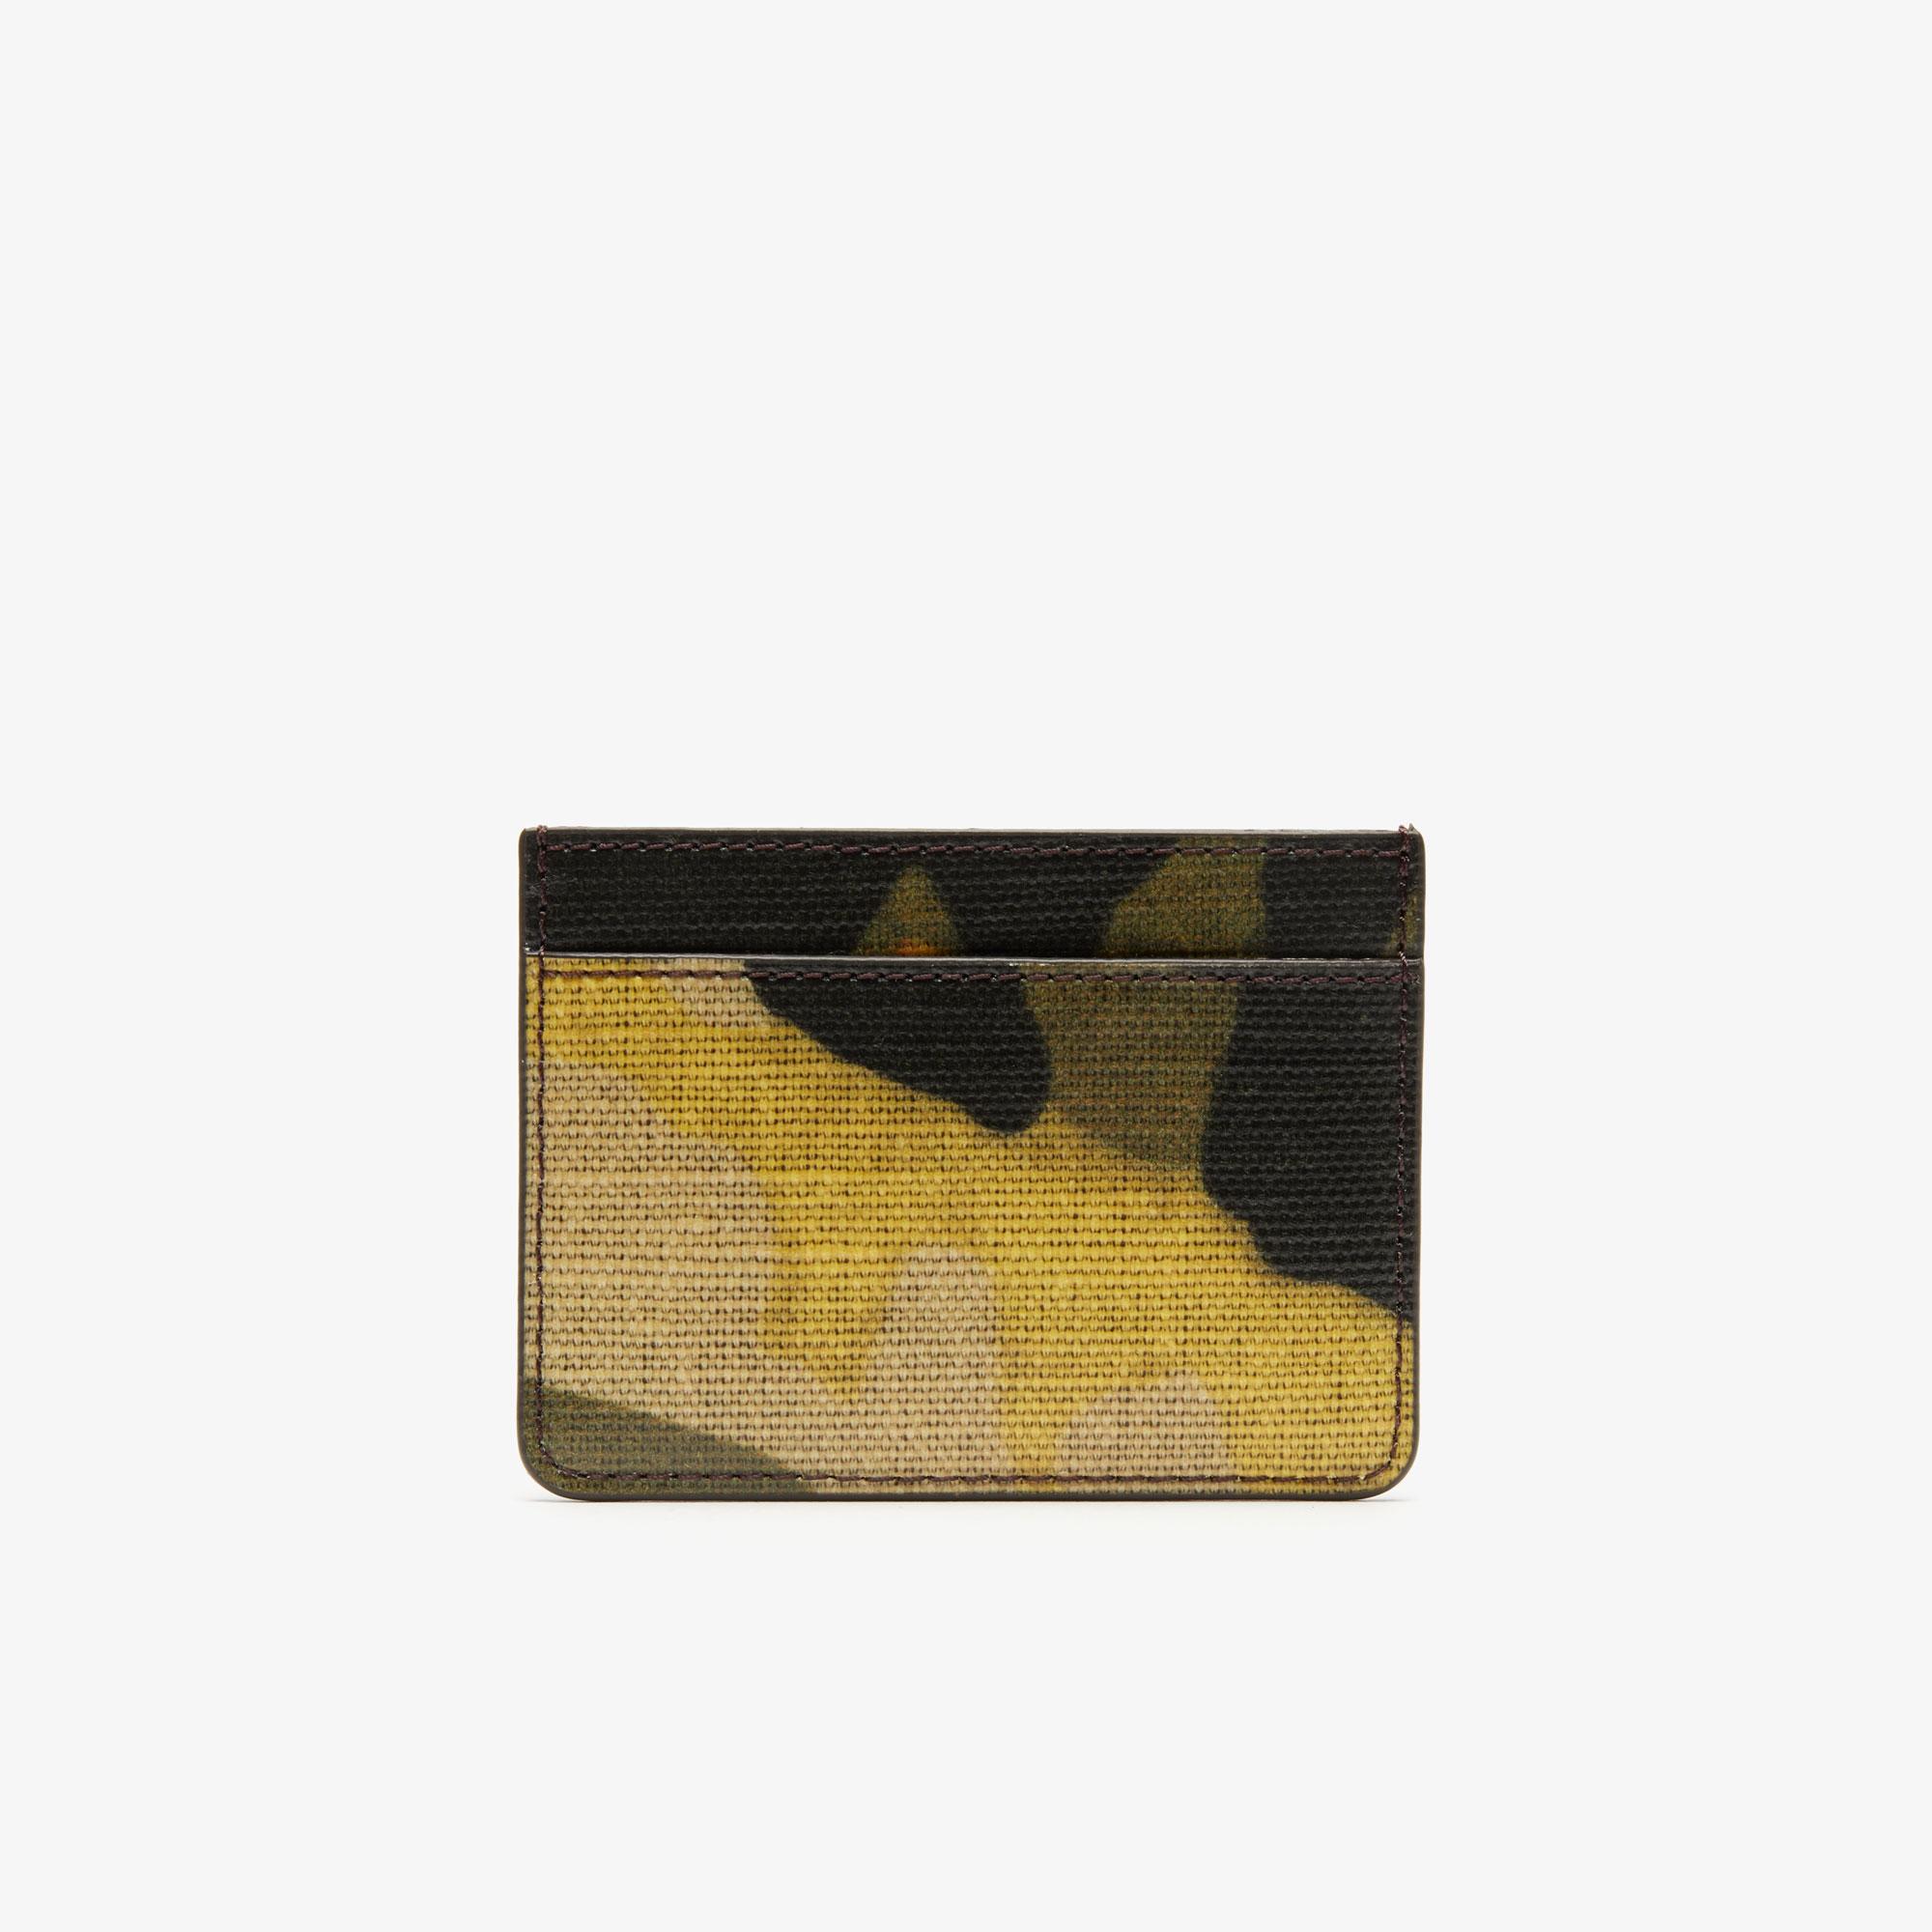 Lacoste гаманець жіночий Robert George